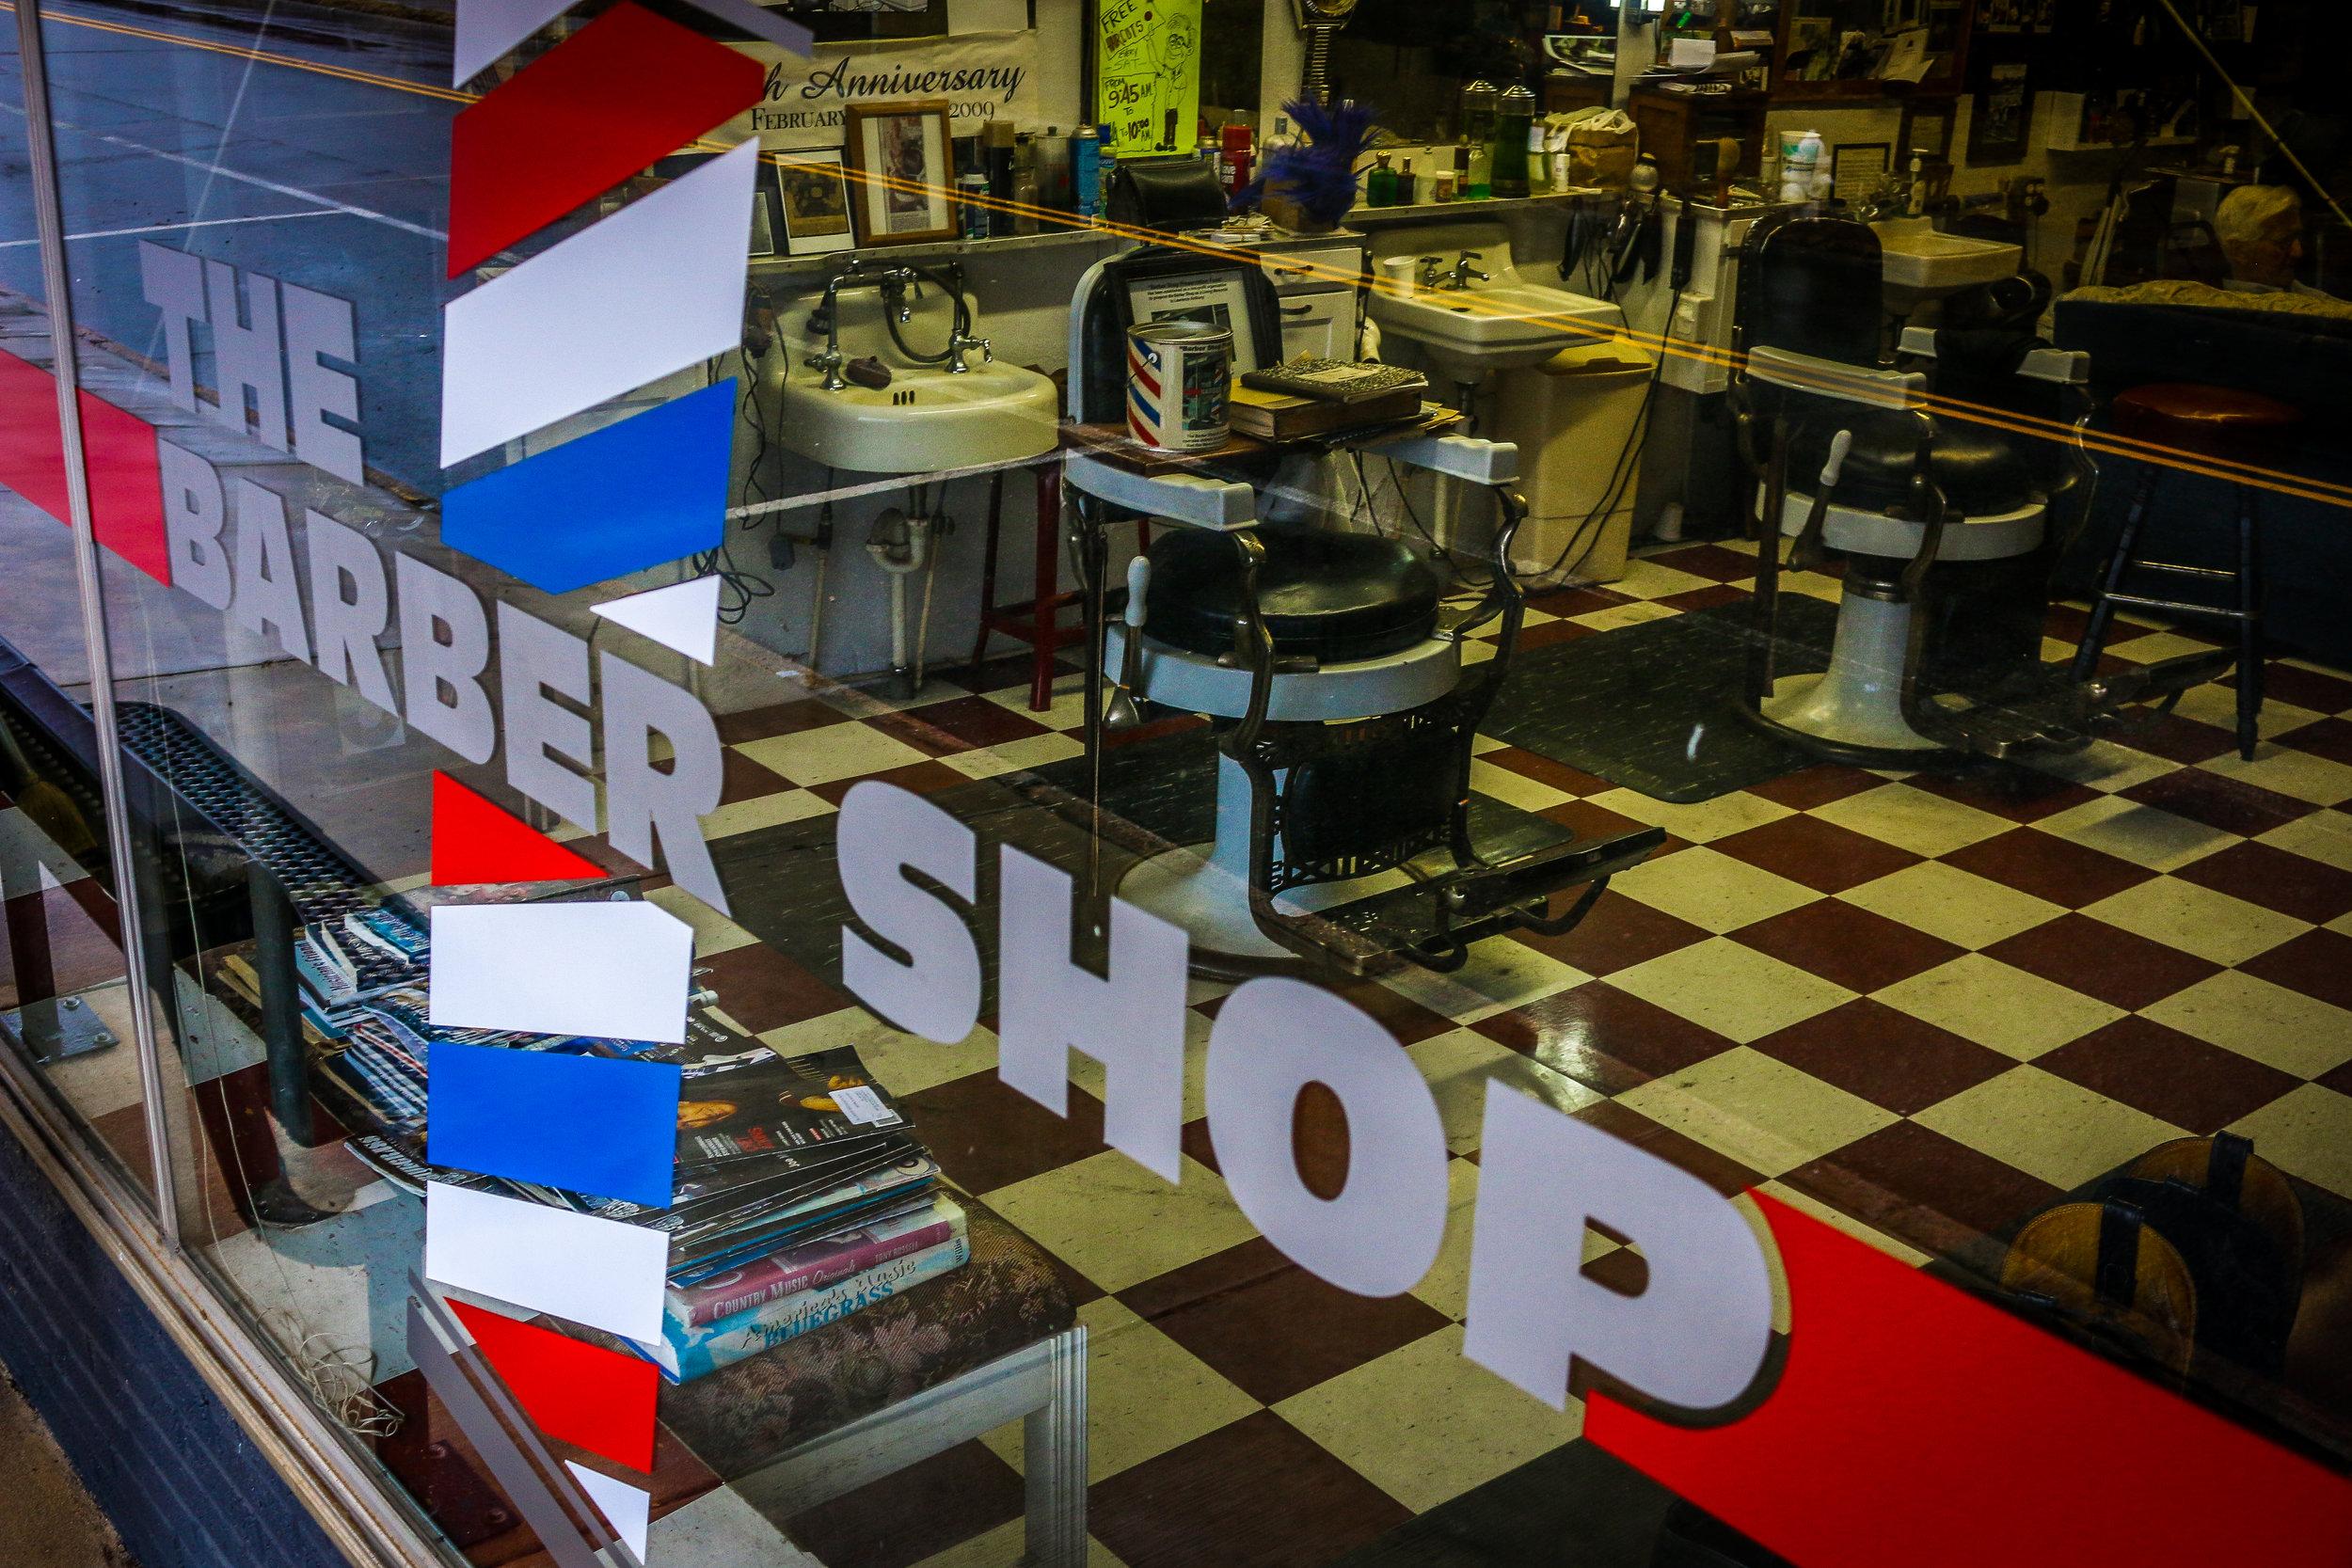 Drexel Barber Shop, a Magical Place